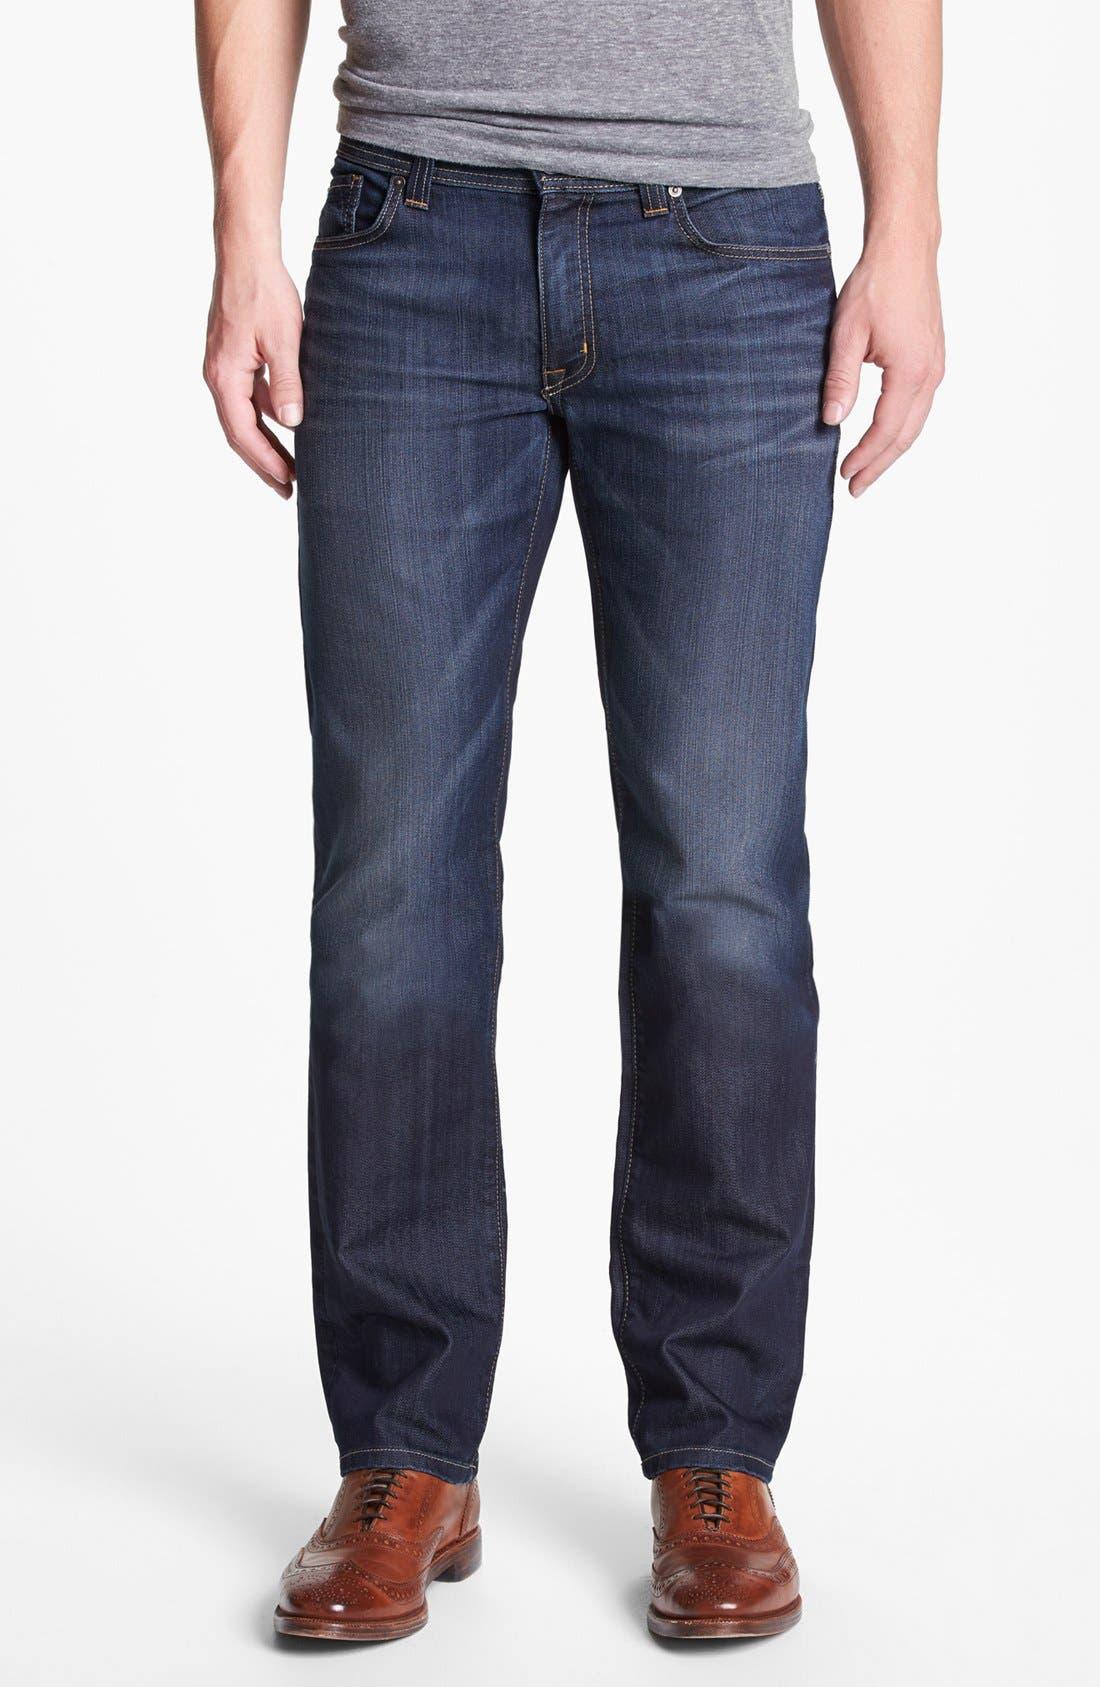 Main Image - Fidelity Denim 'Slim Jim' Slim Fit Jeans (Trigger Dark) (Tall)